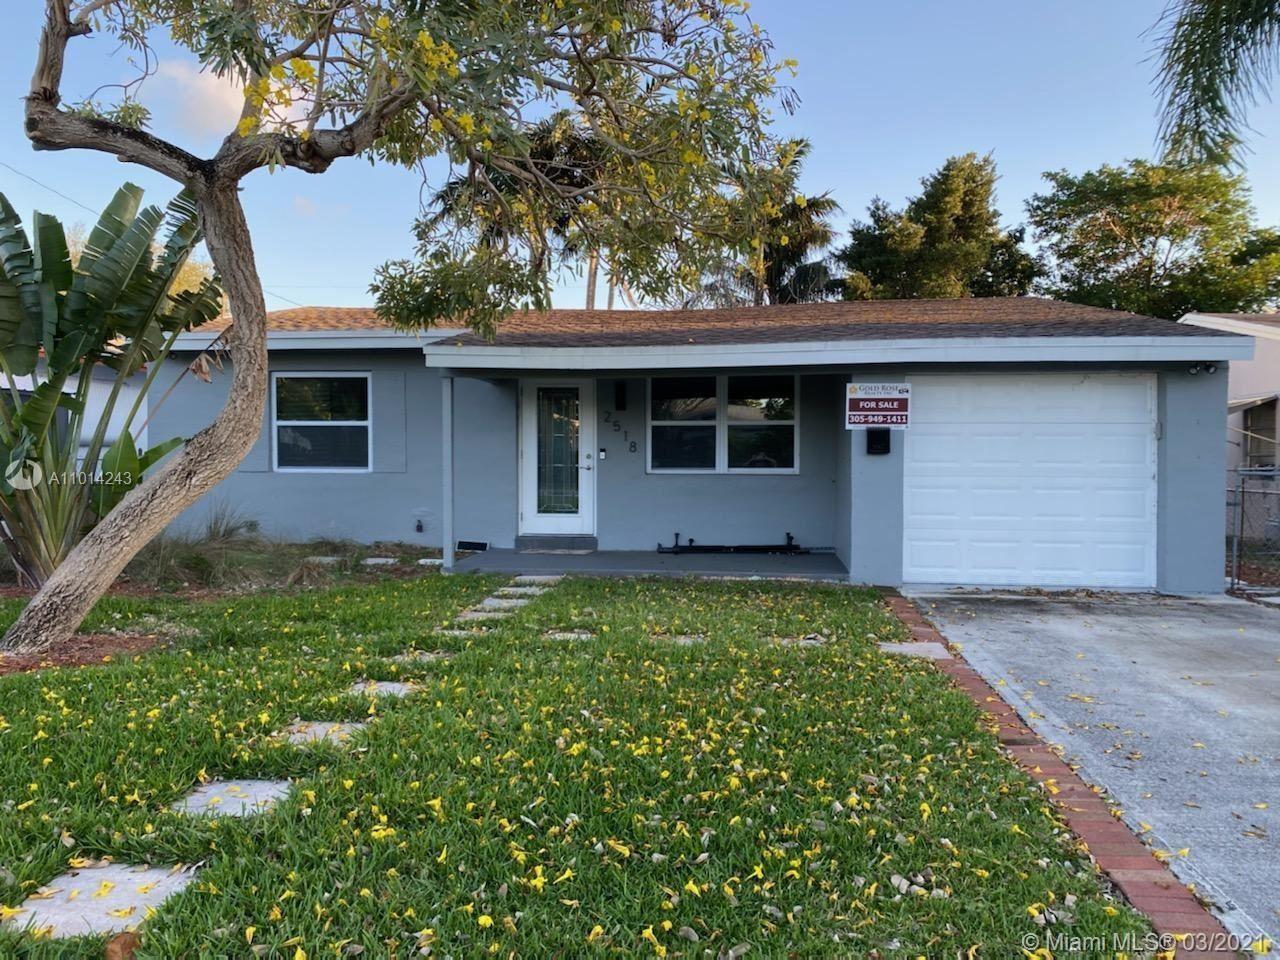 2518 Roosevelt St, Hollywood, FL 33020 - #: A11014243